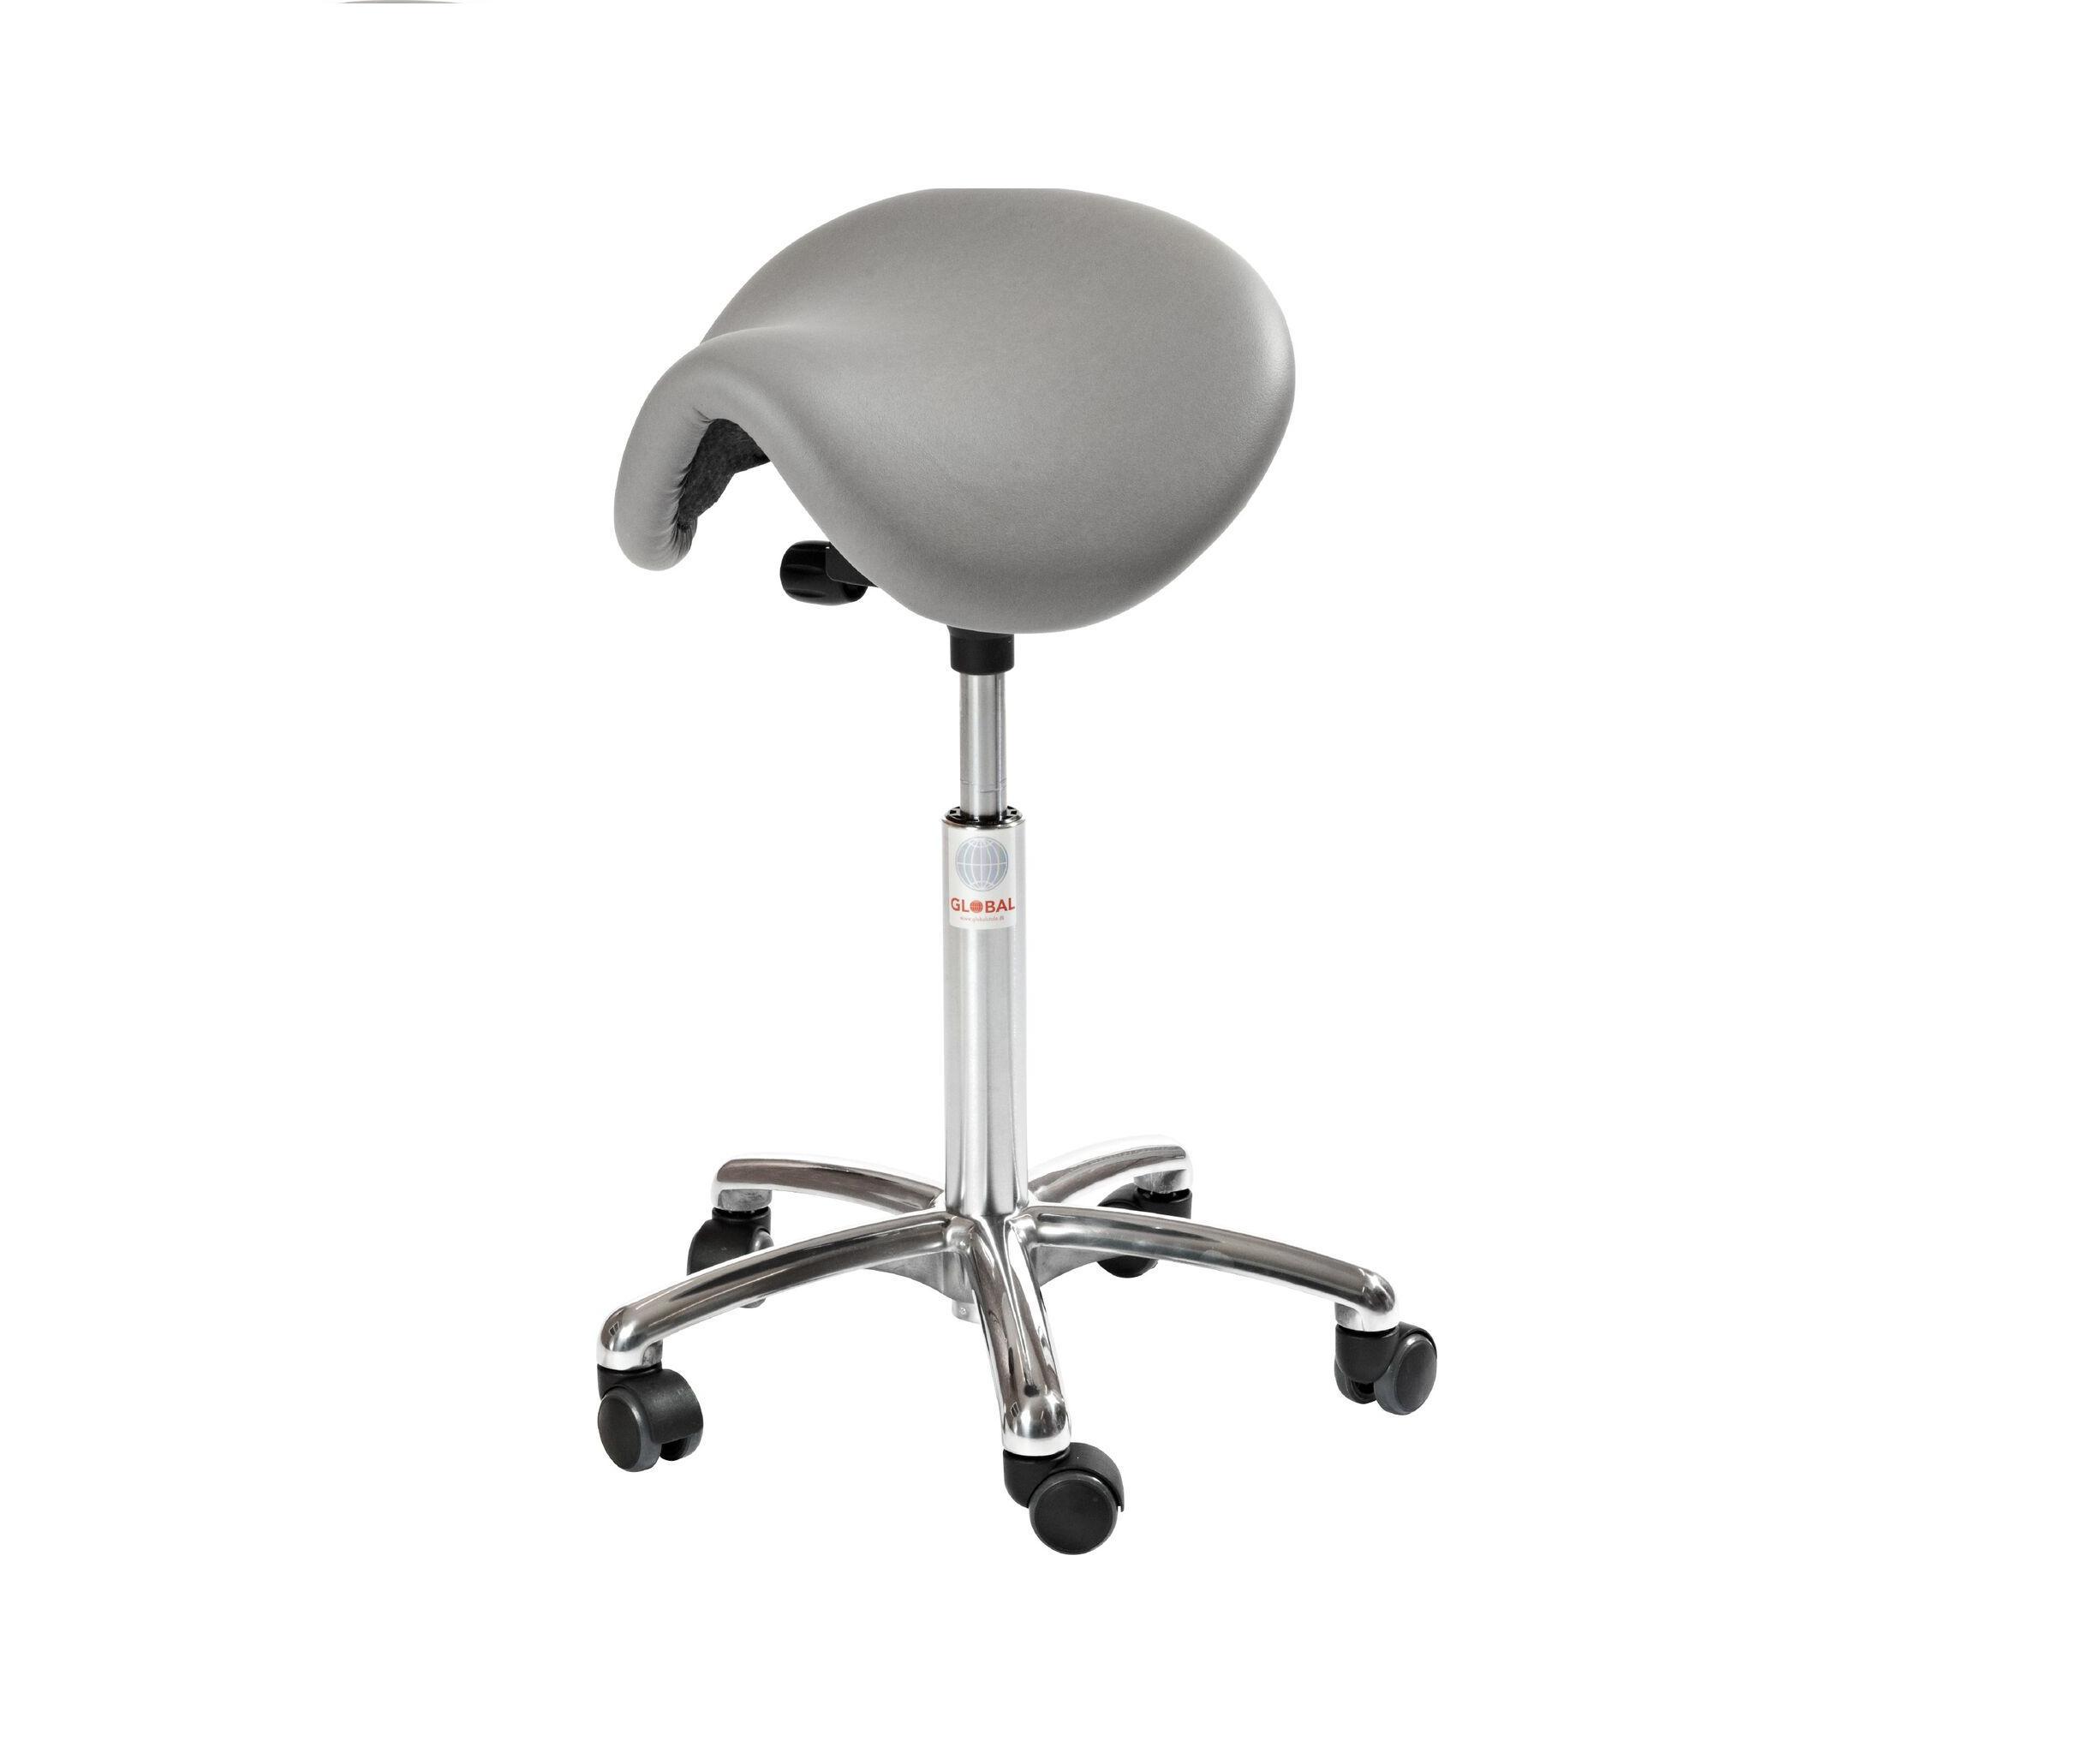 Arbetsstol Global sadel utan rygg